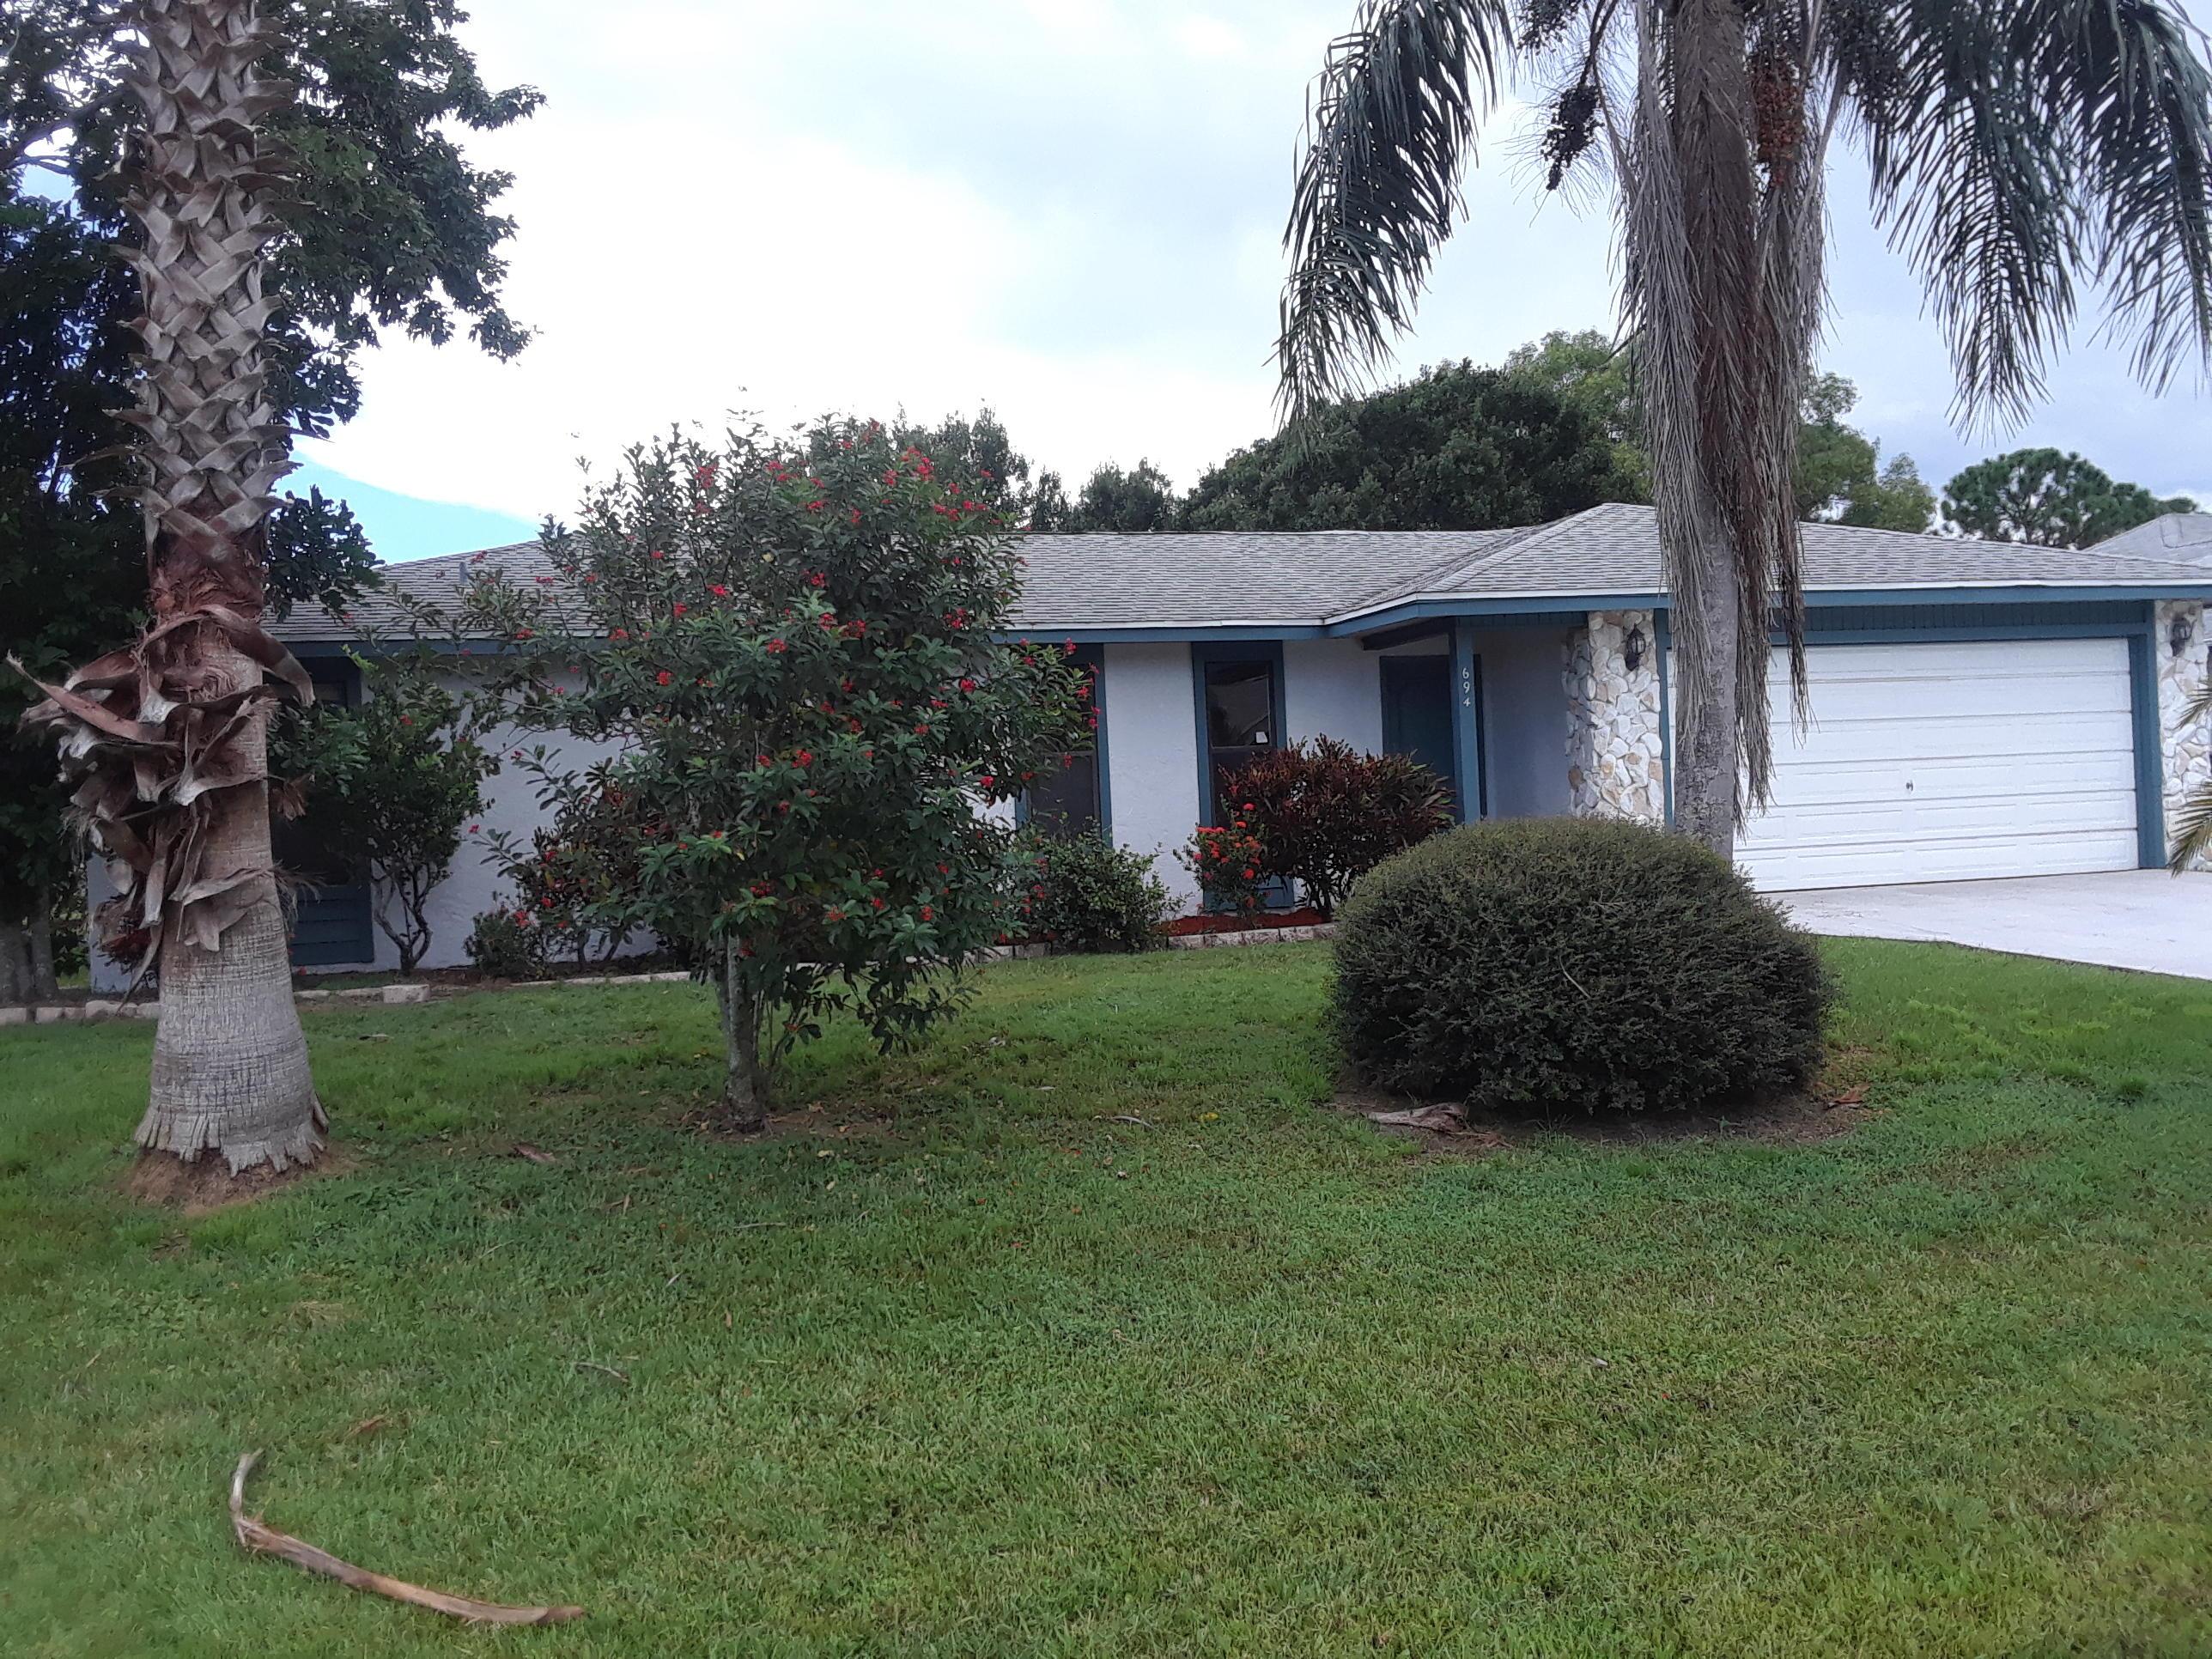 694 Se Evergreen Terrace, Port Saint Lucie, FL 34983